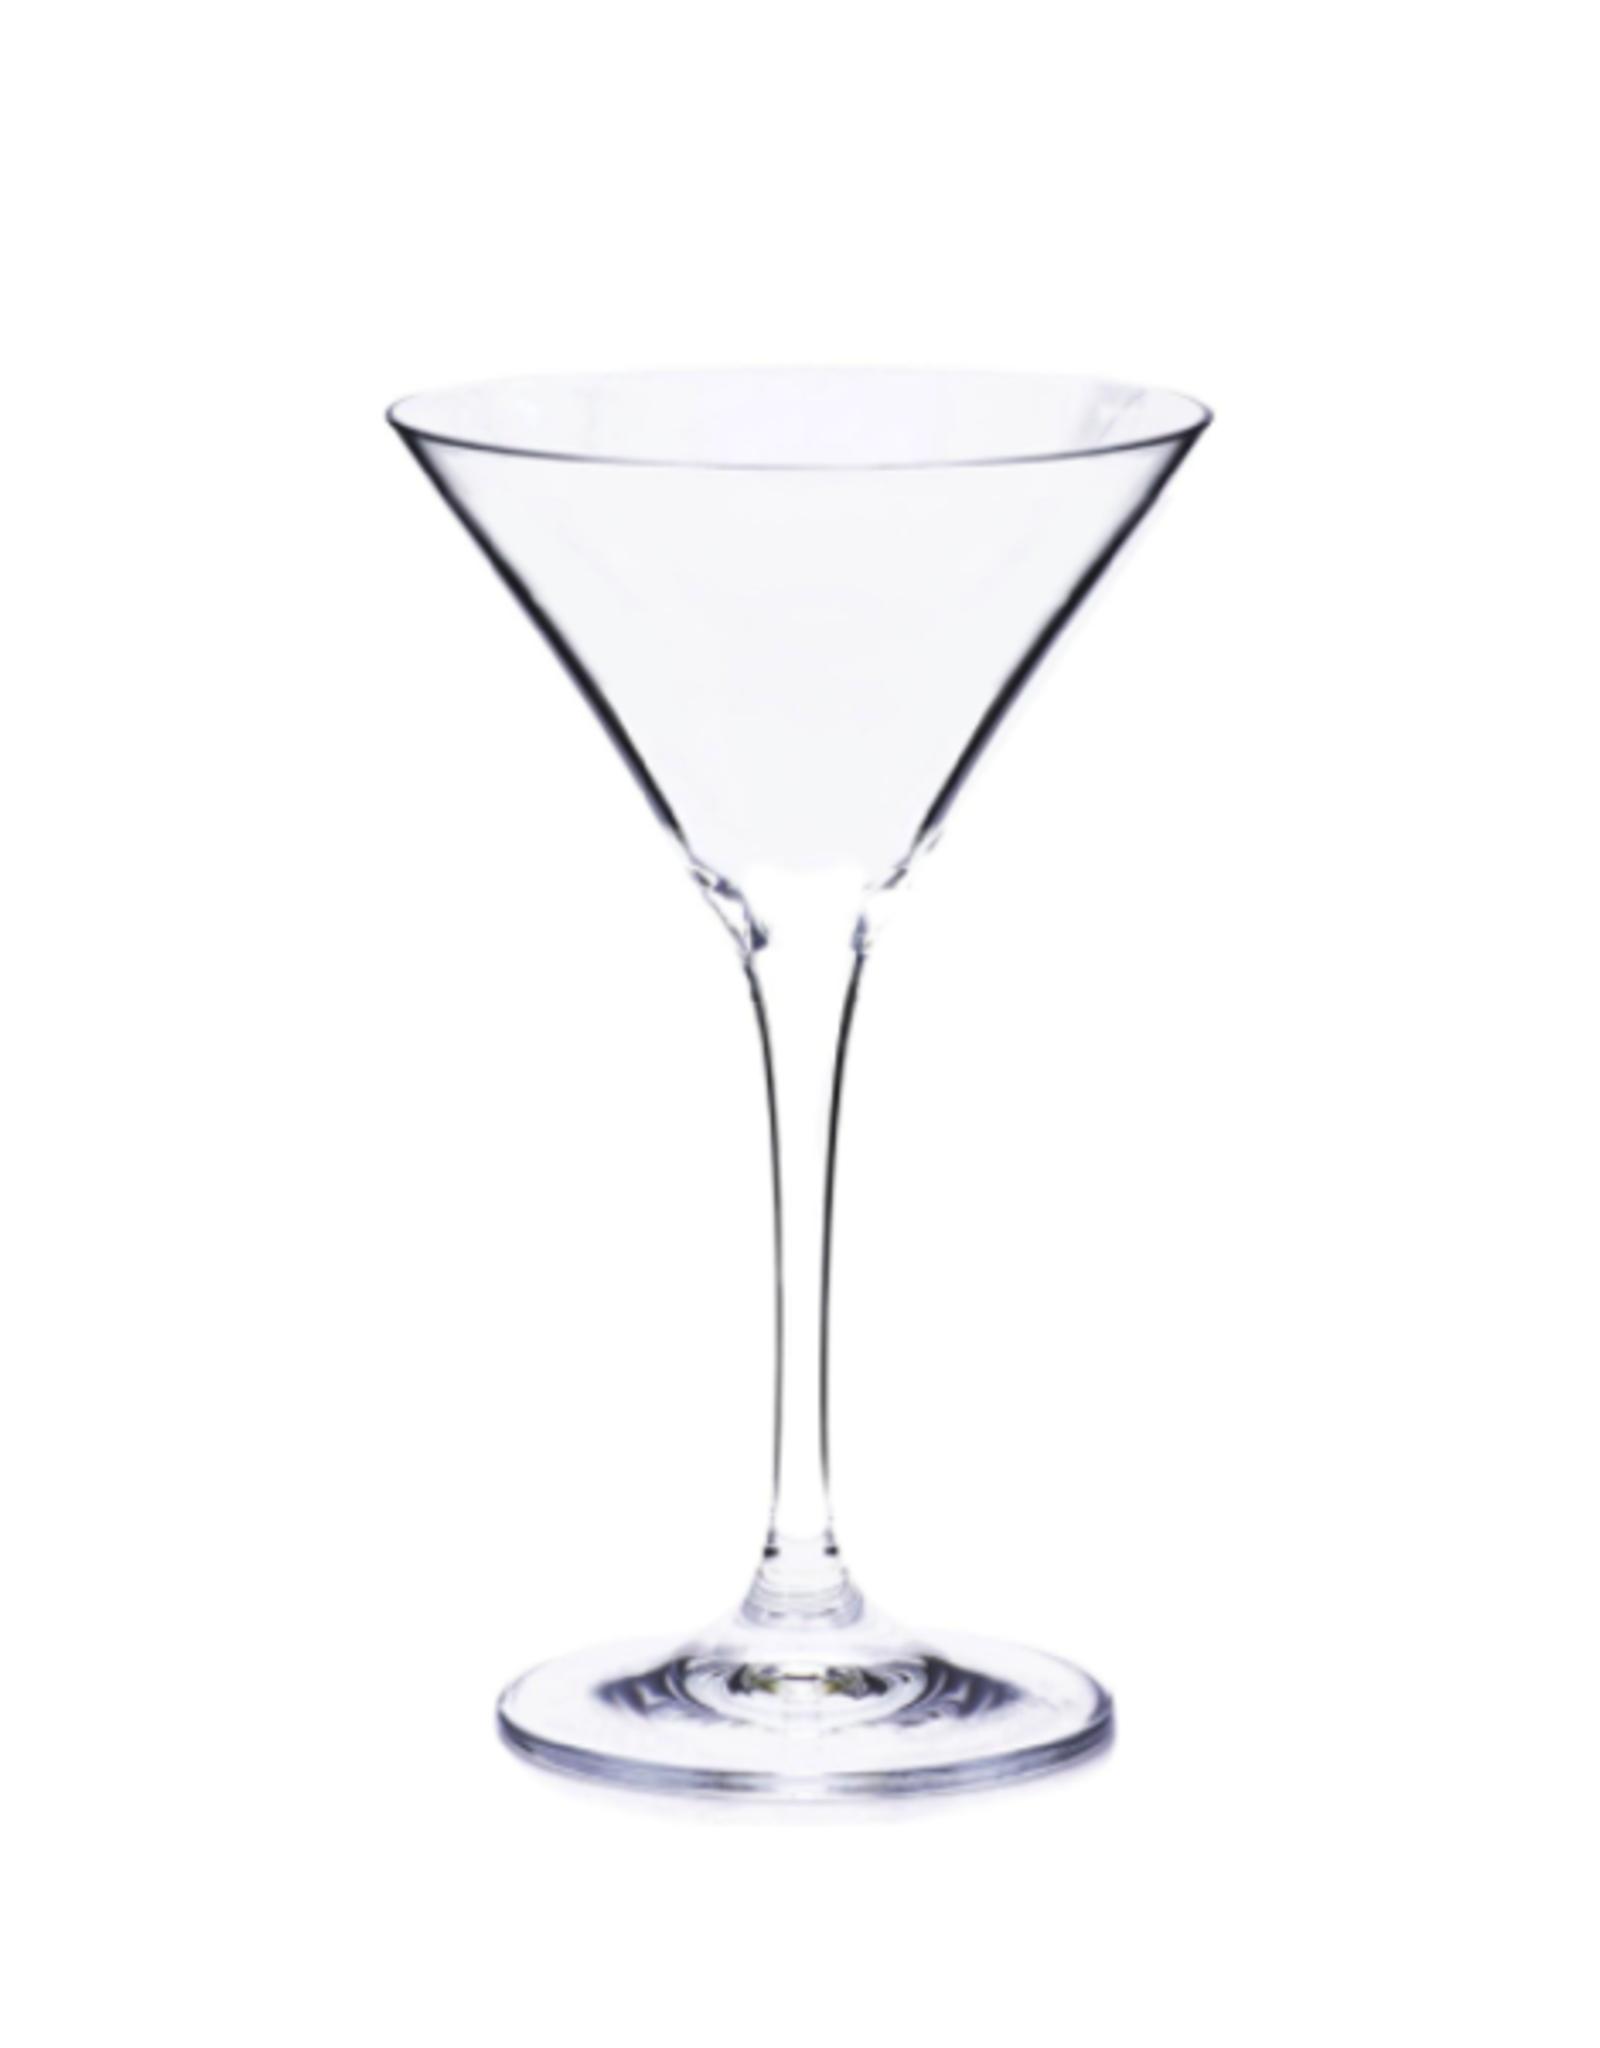 JMI - Draper Martini/Glass, 5.5oz